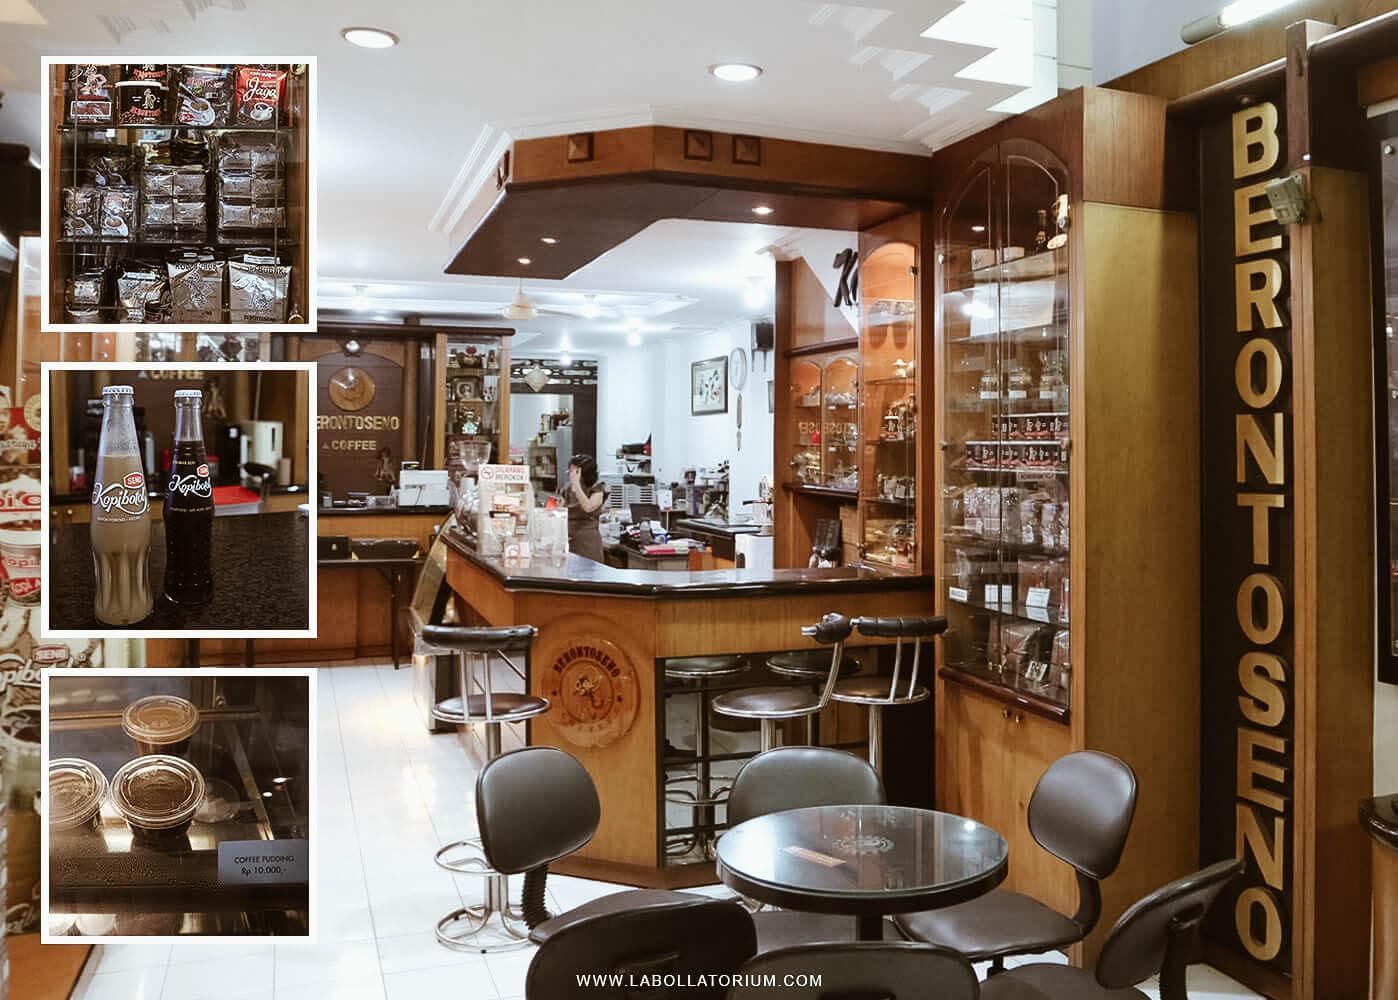 Kopi Berontoseno Kediri - 7 Tempat Recommended Saat Explore Kediri Circa 2017